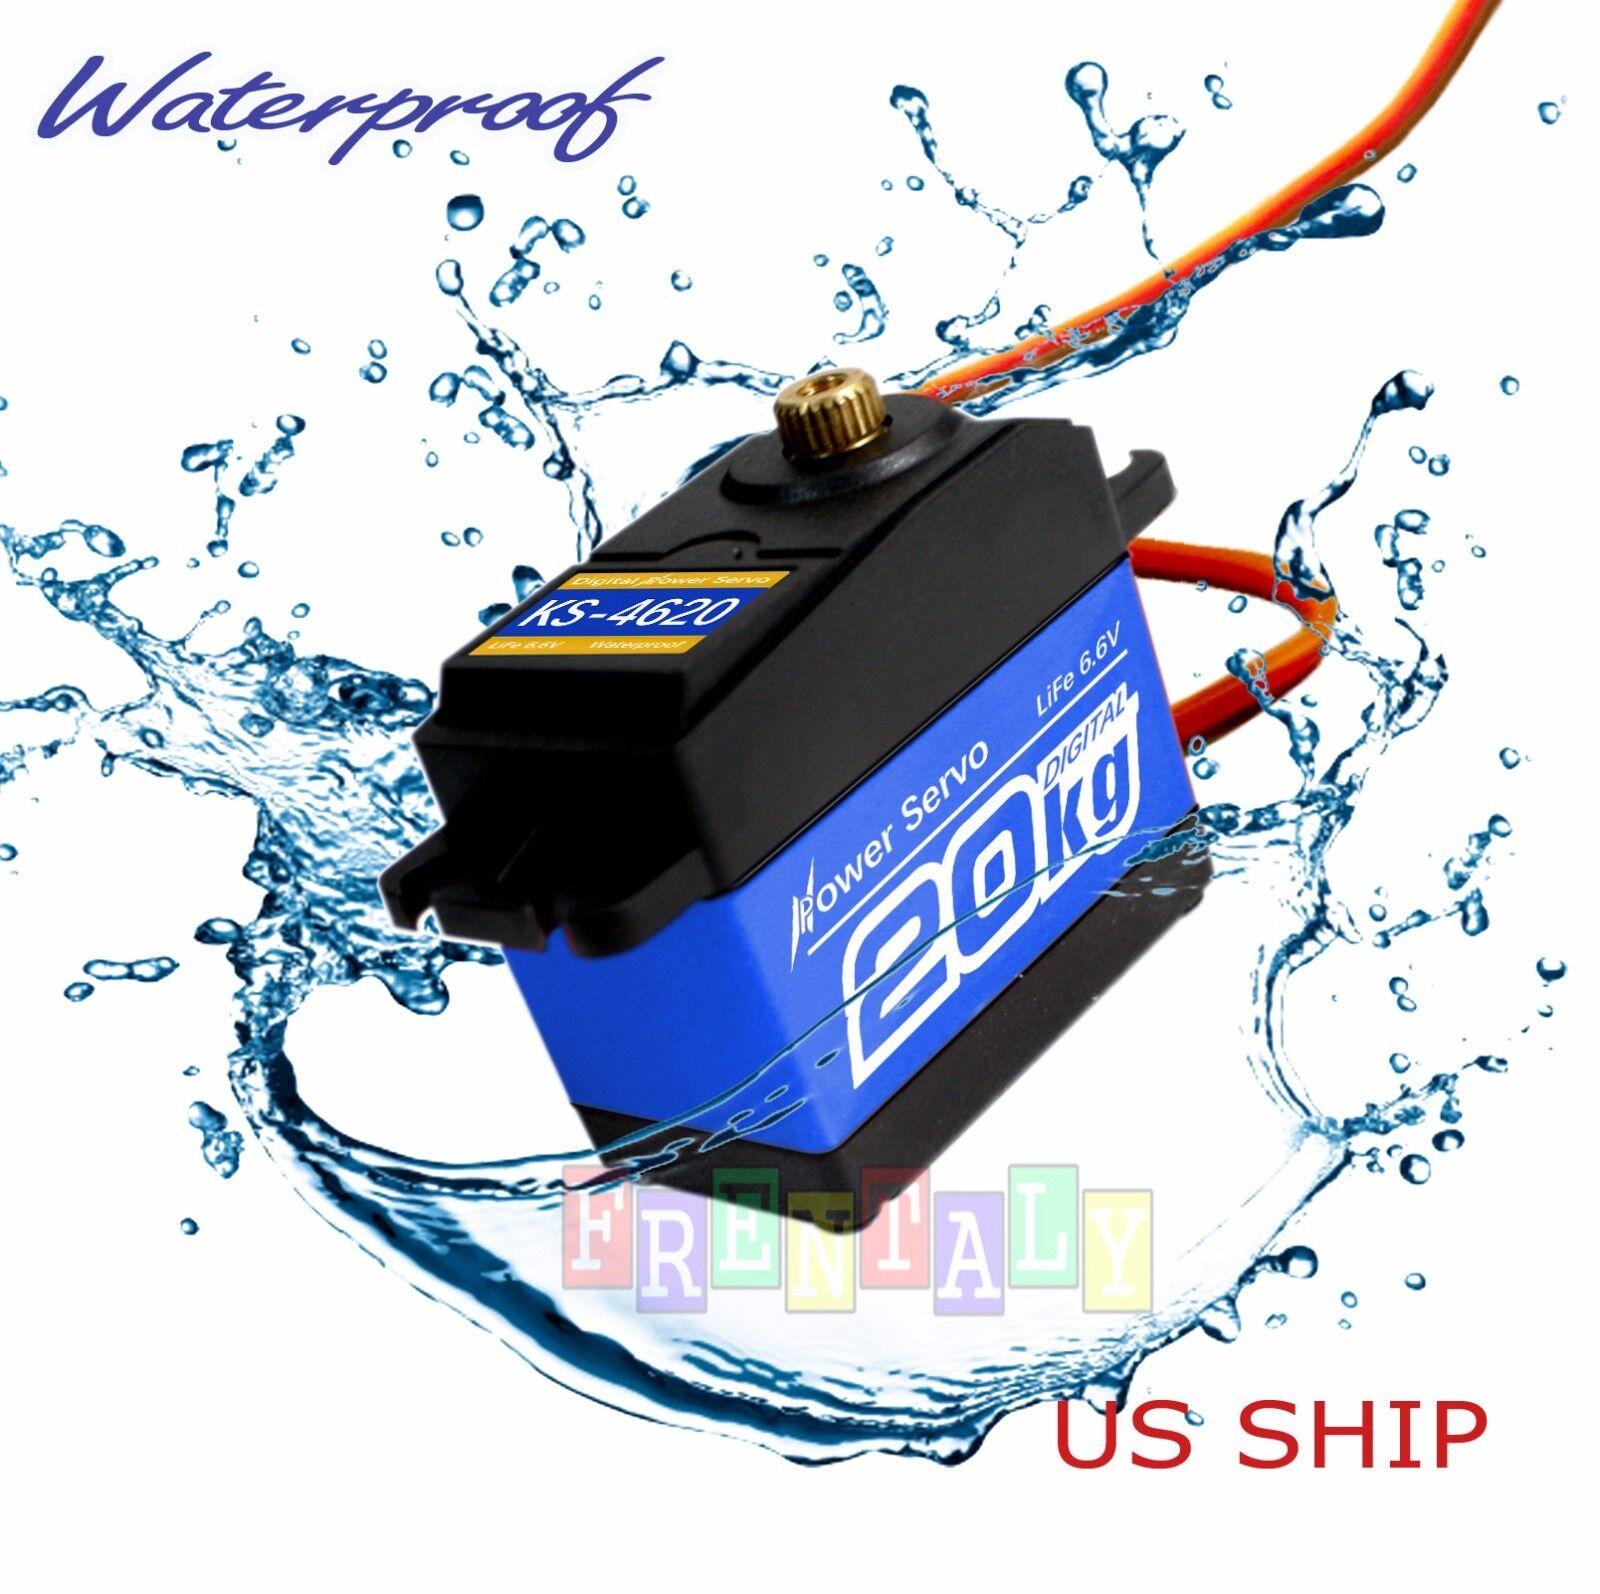 K5 waterproof high torque metal gear rc servo motor for Rc car servo motor